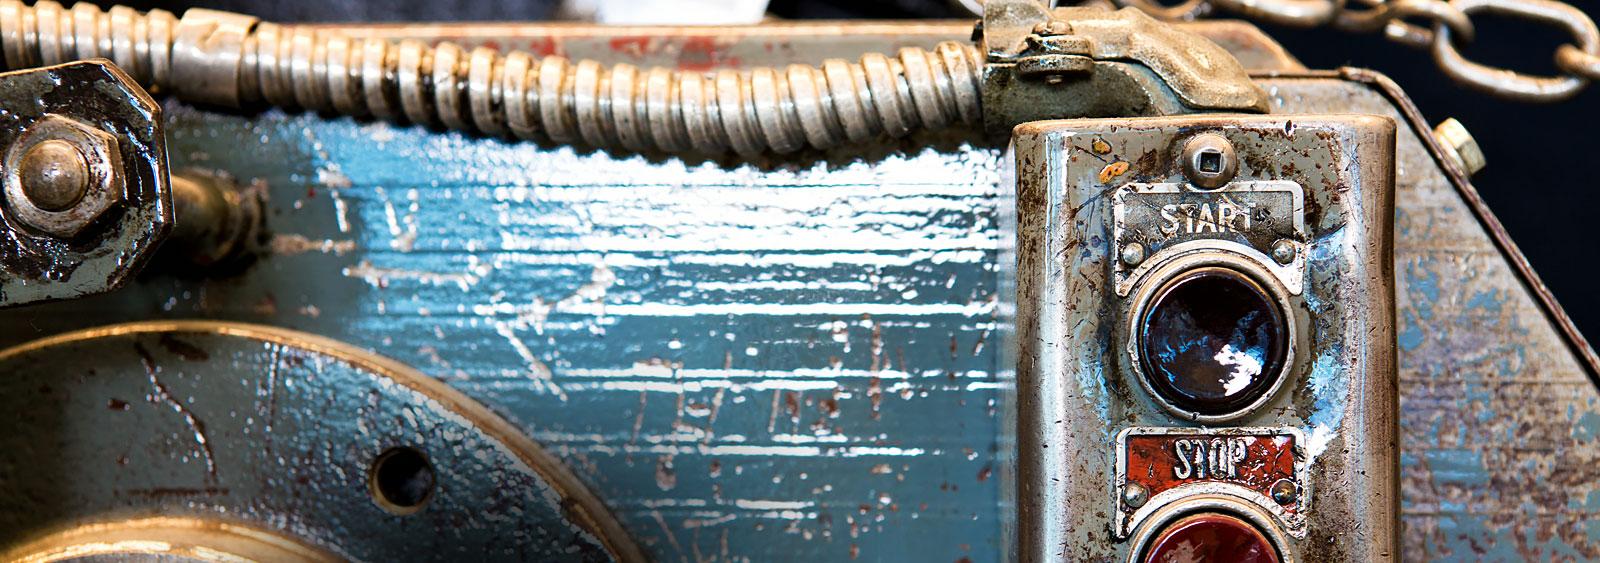 Welding And Fabrication Engineer Resume - Virtren.com